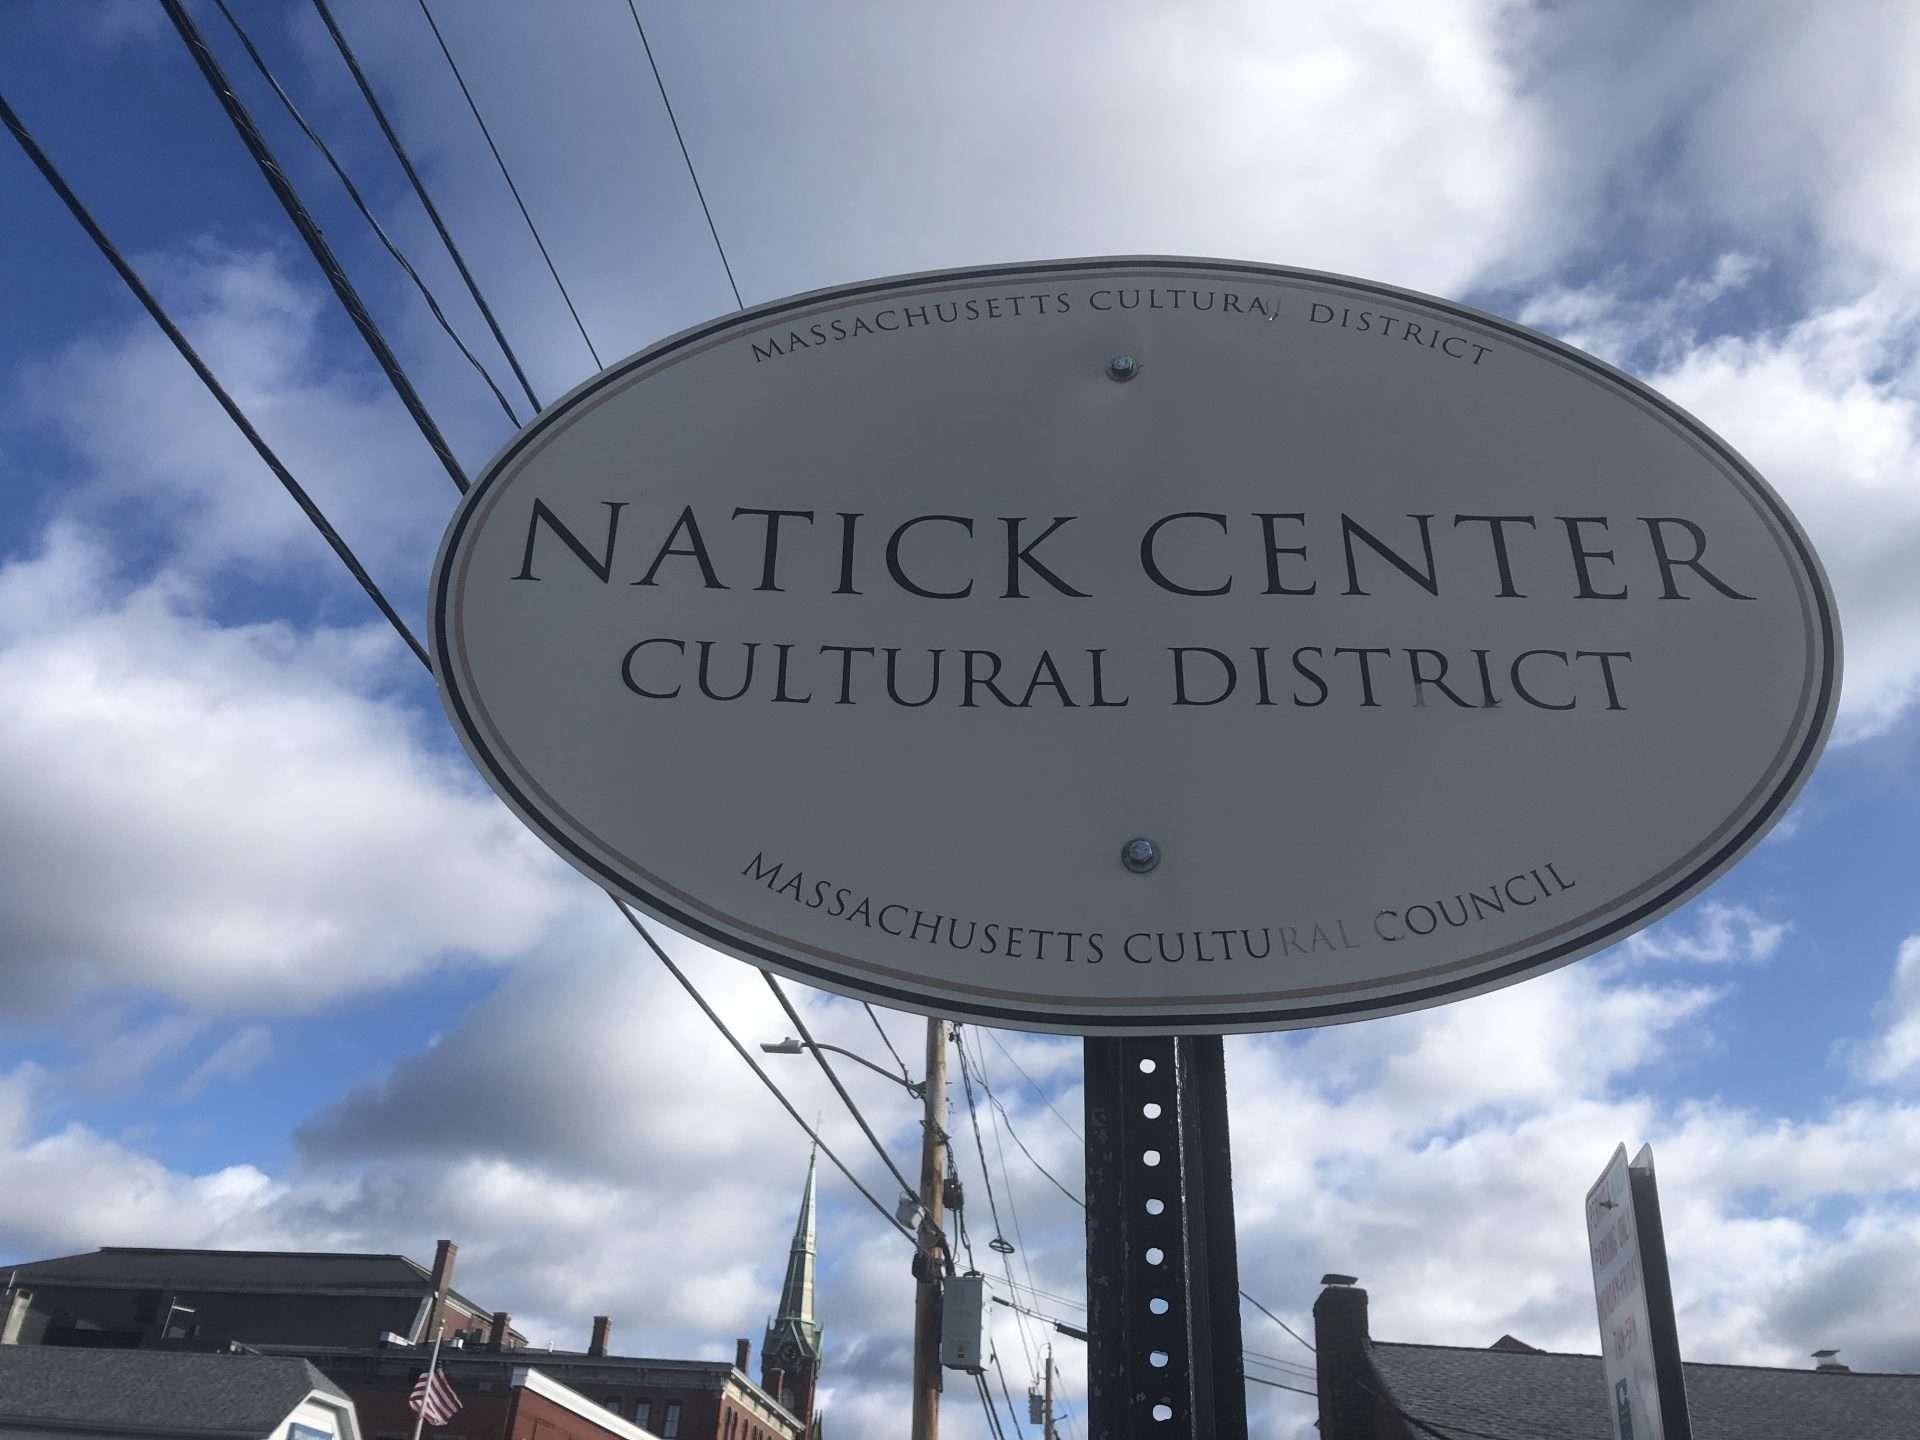 natick center cultural district sign